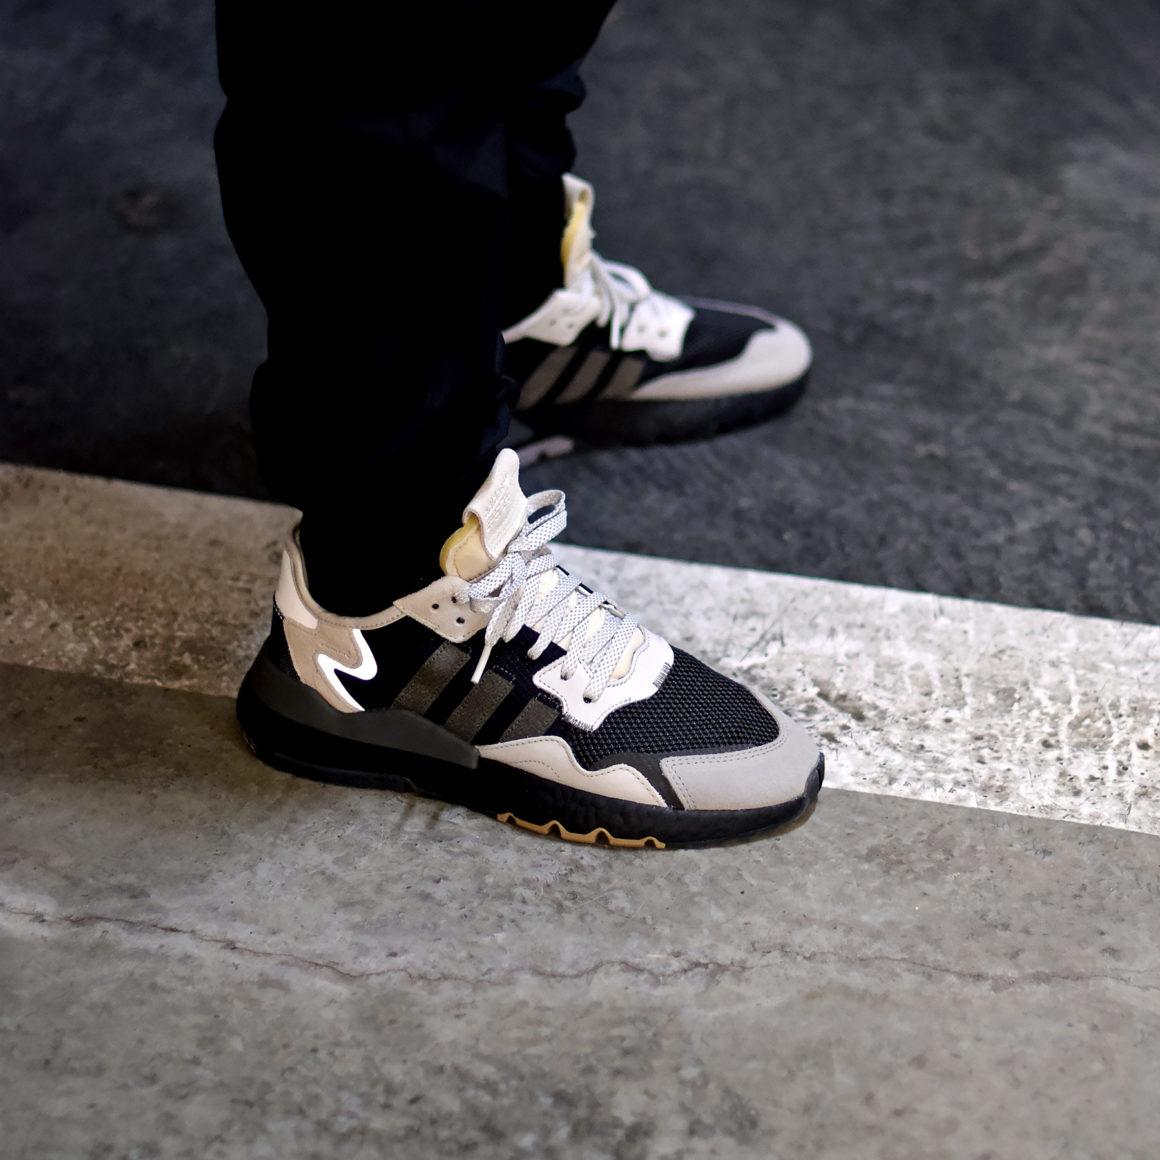 adidas-nite-jogger-black-white-12